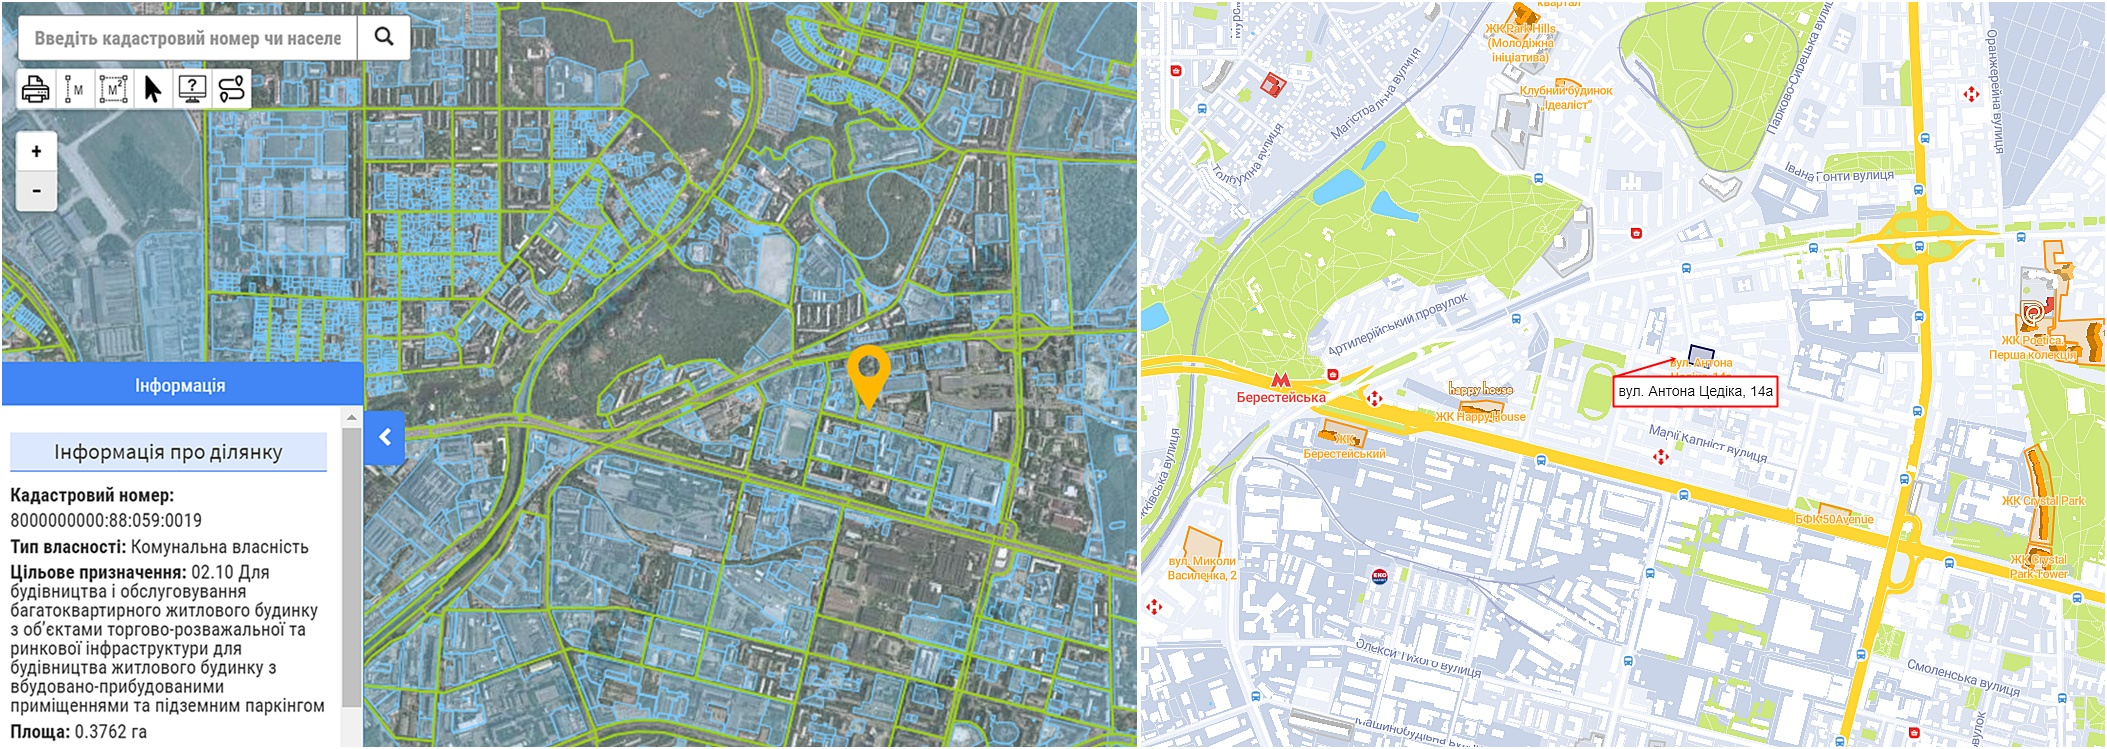 Проект по ул. Антона Цедика, 14а данные кадастра и на карте